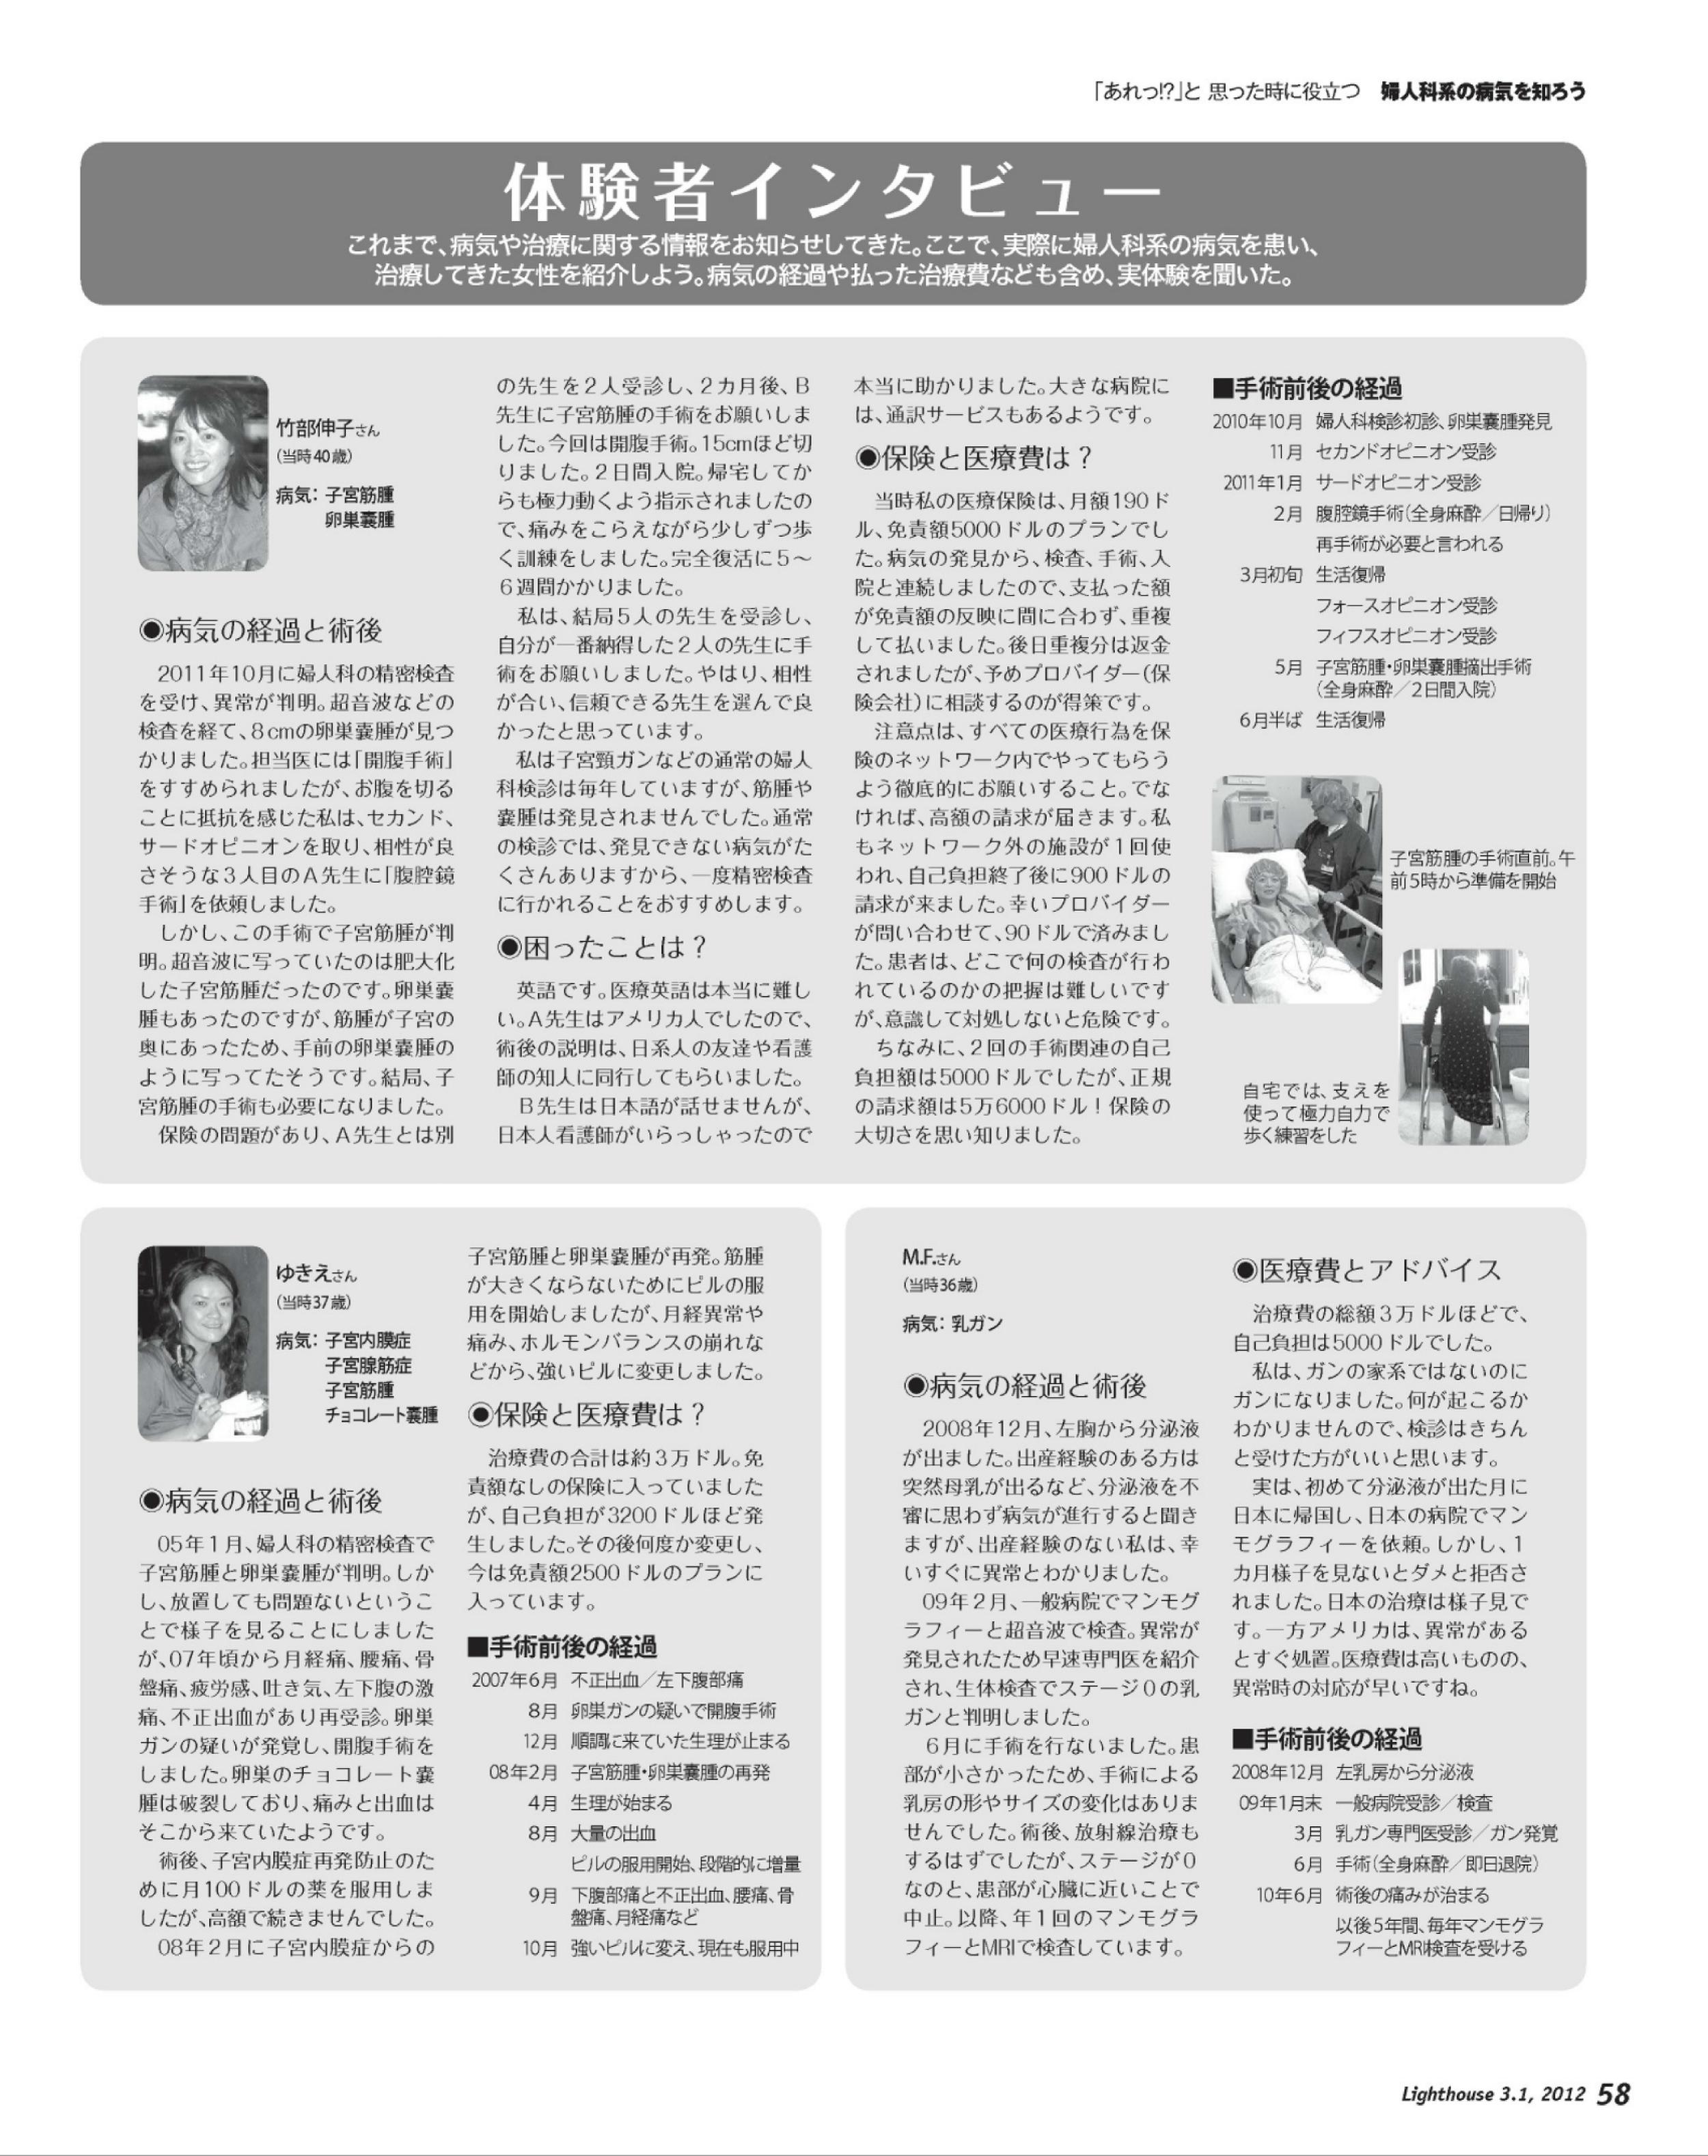 Lighthouse LA March 1, 2012 Page-1-5.jpg